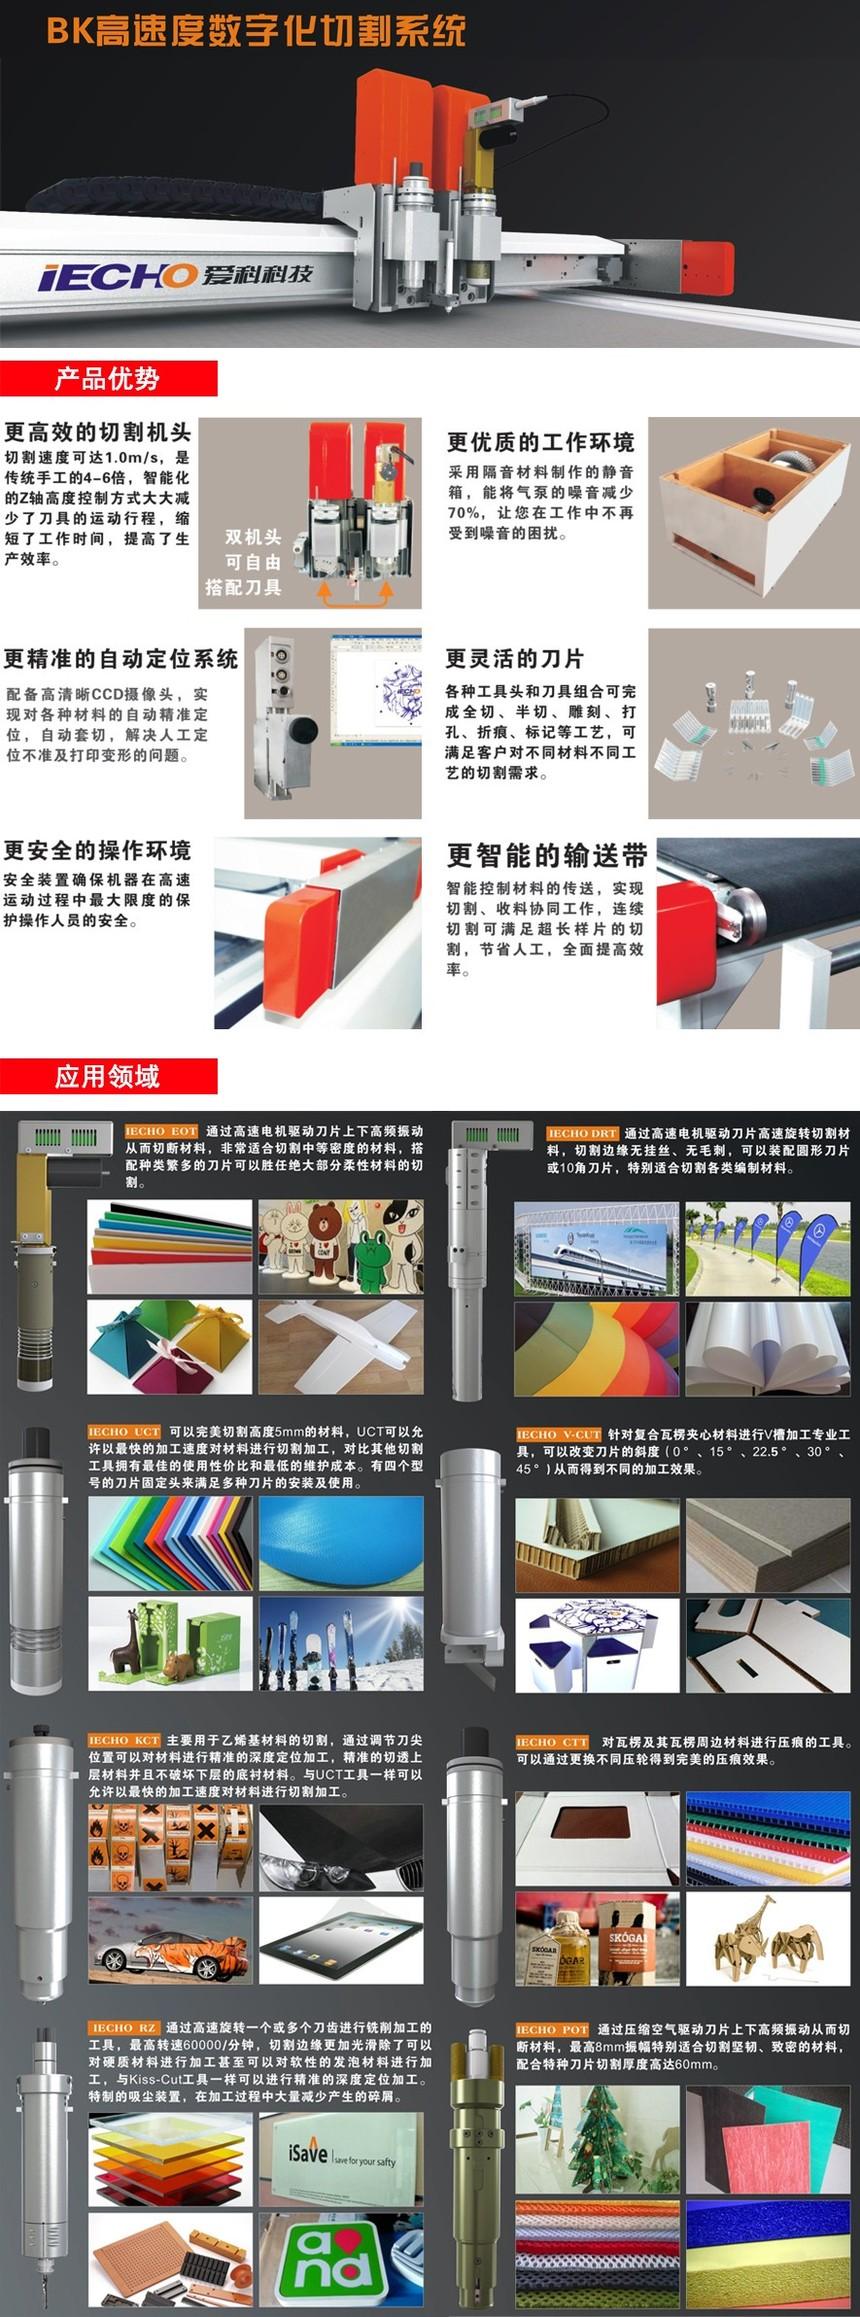 BKL-高速数字化切割系统..jpg